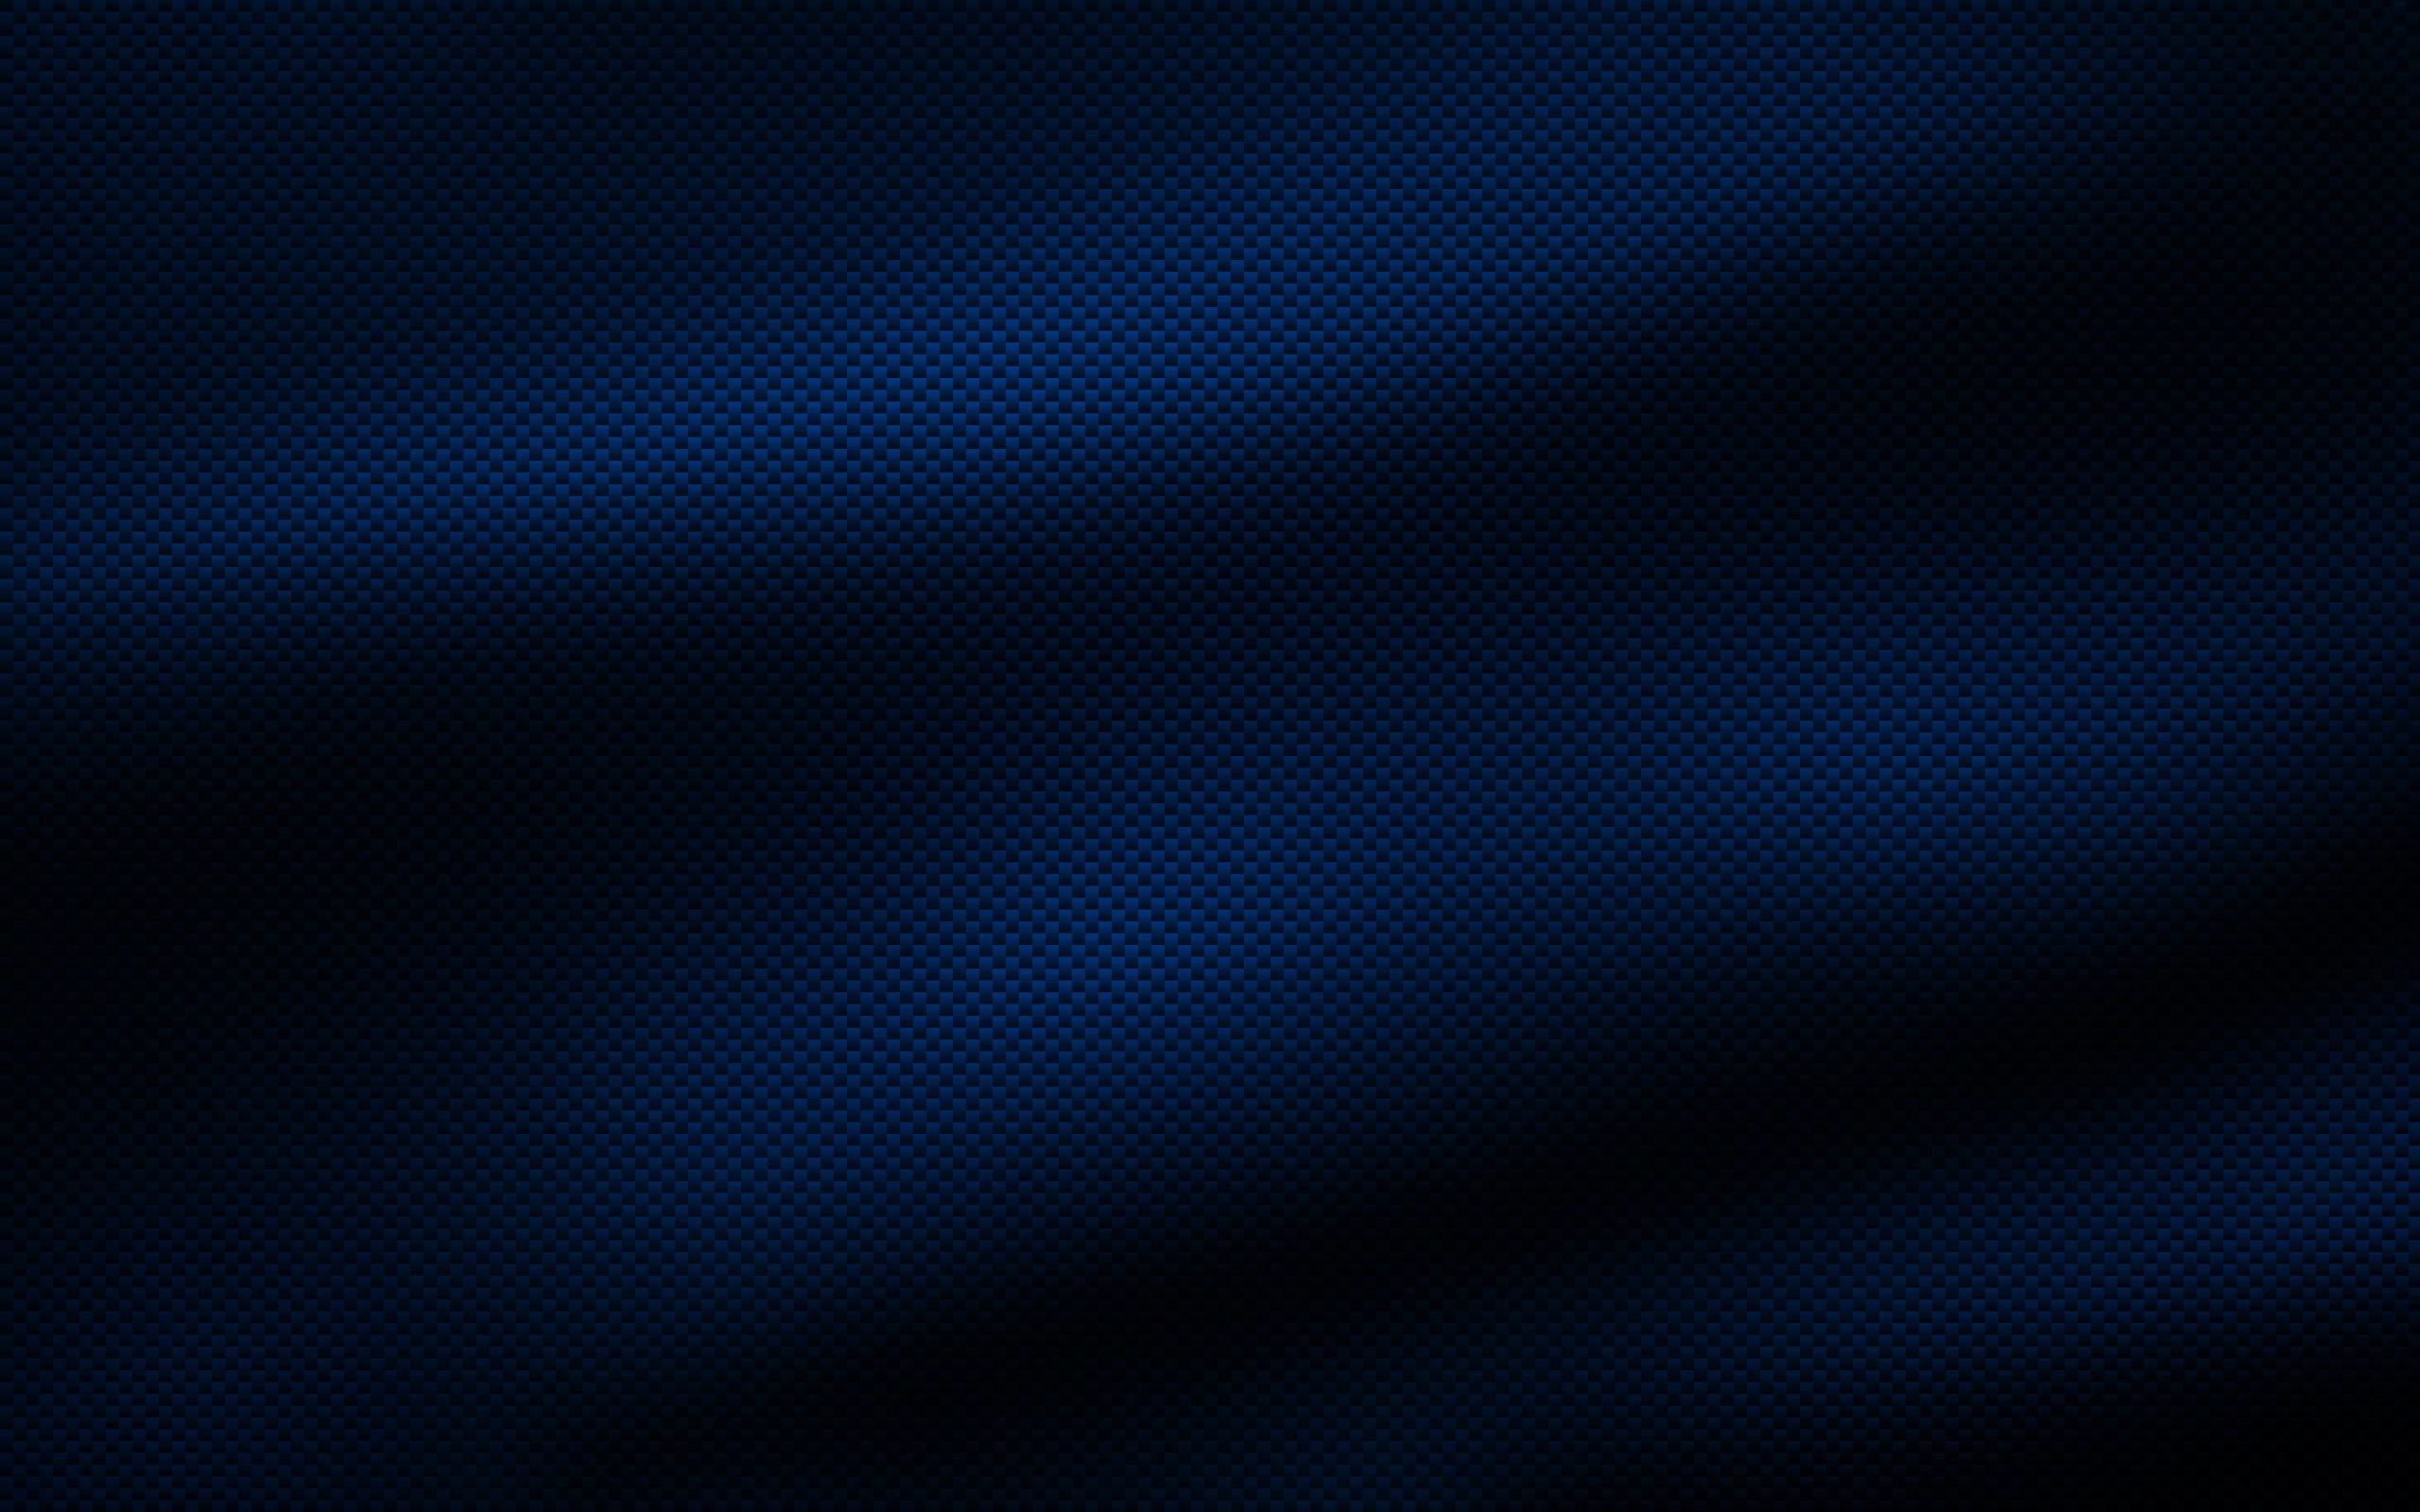 Name Live Wallpaper 3d Blue Carbon Fiber Wallpaper 41563 2560x1600 Px